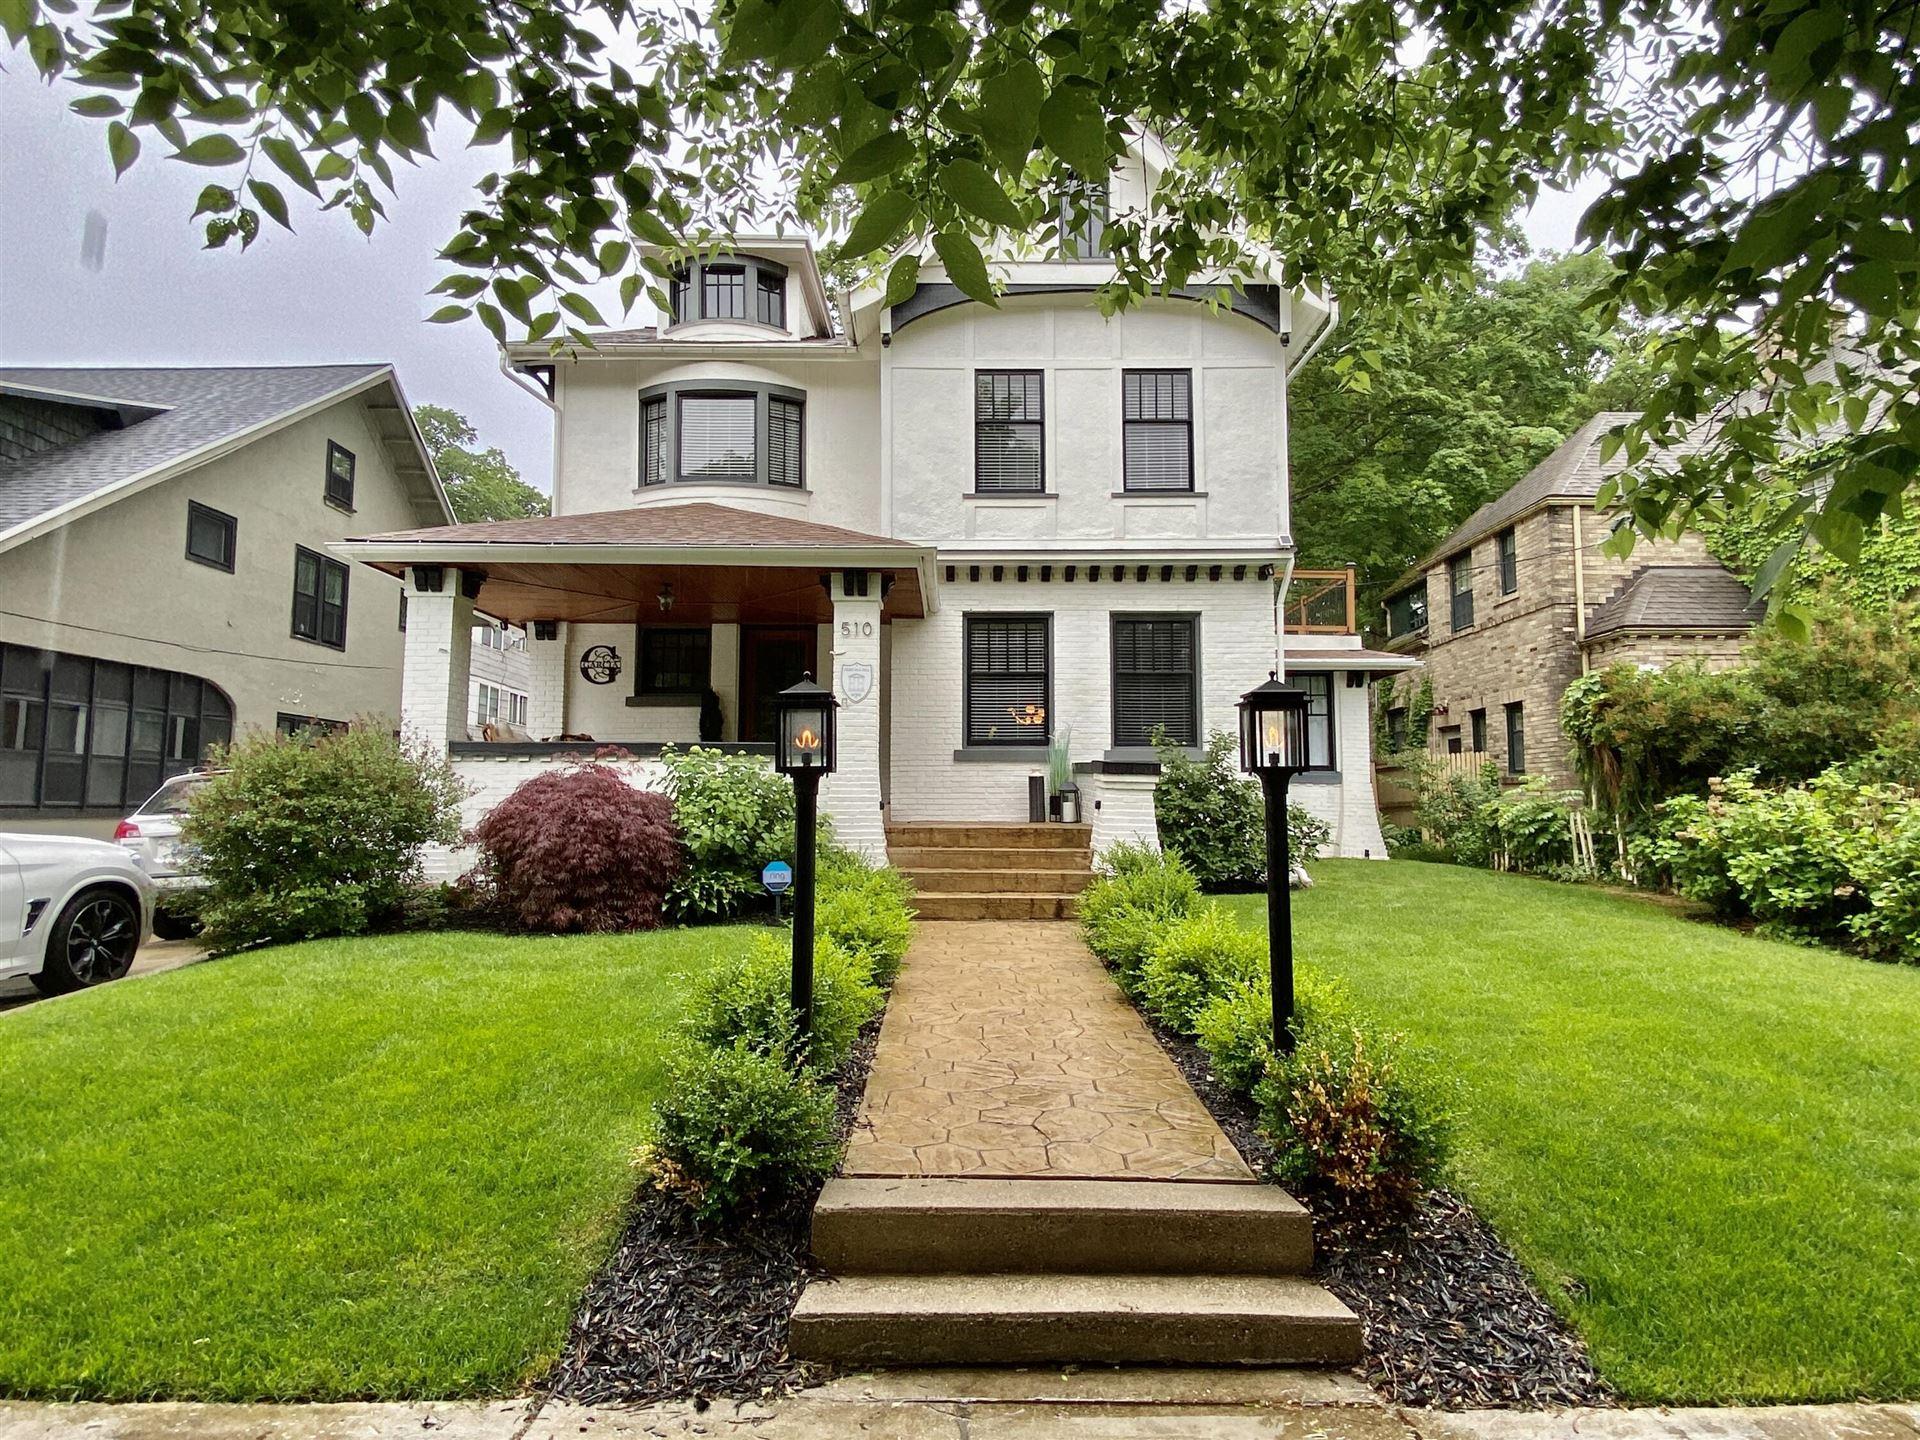 510 prospect ave se Avenue SE, Grand Rapids, MI 49503 - MLS#: 21106910